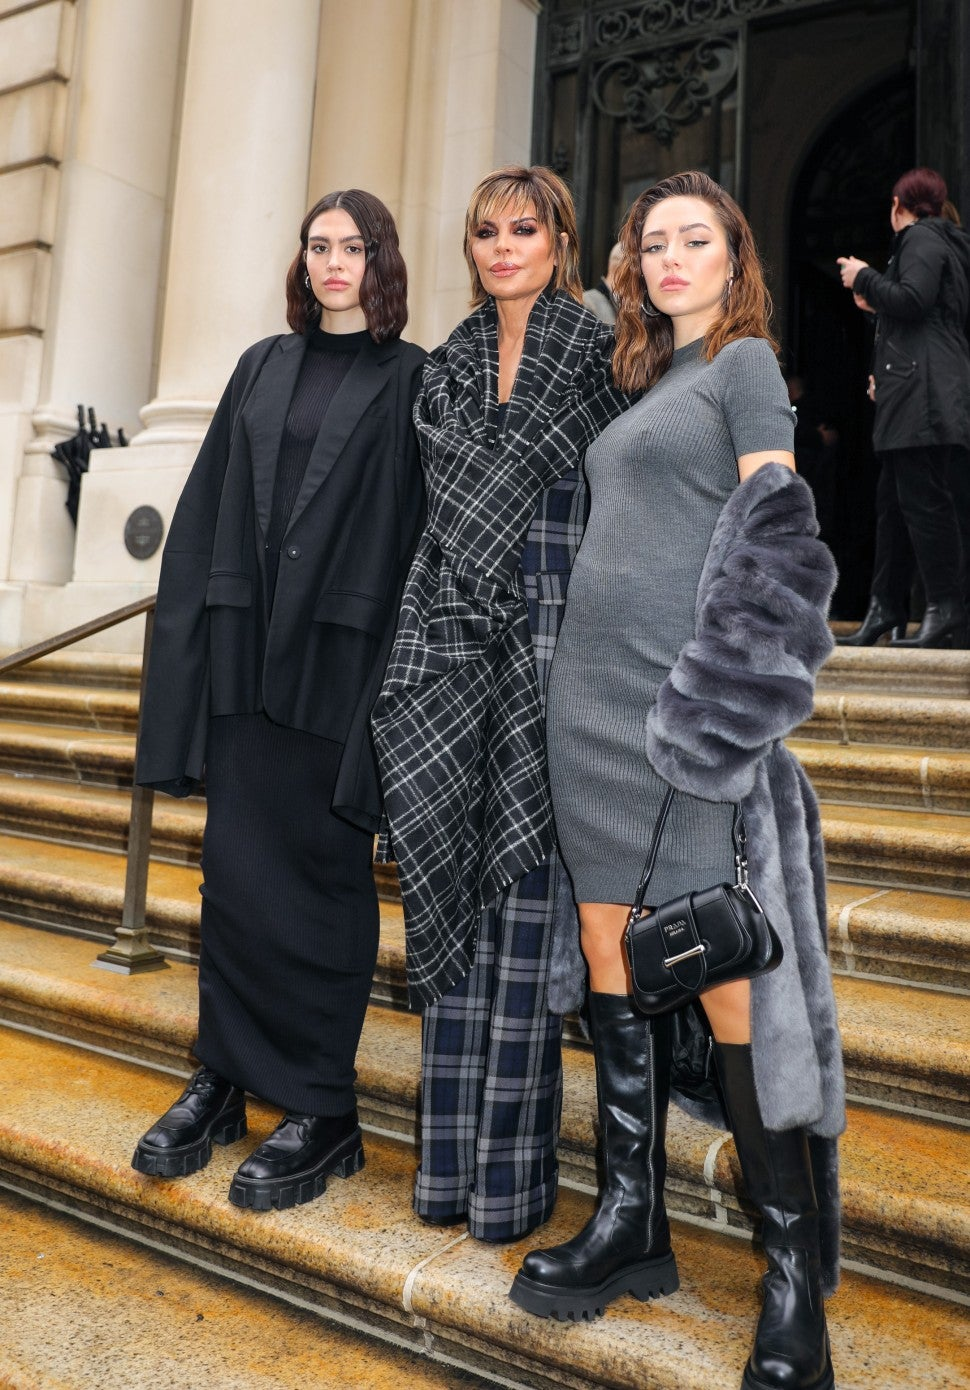 Amelia Gray Hamlin, Lisa Rinna and Delilah Belle Hamlin at nyfw